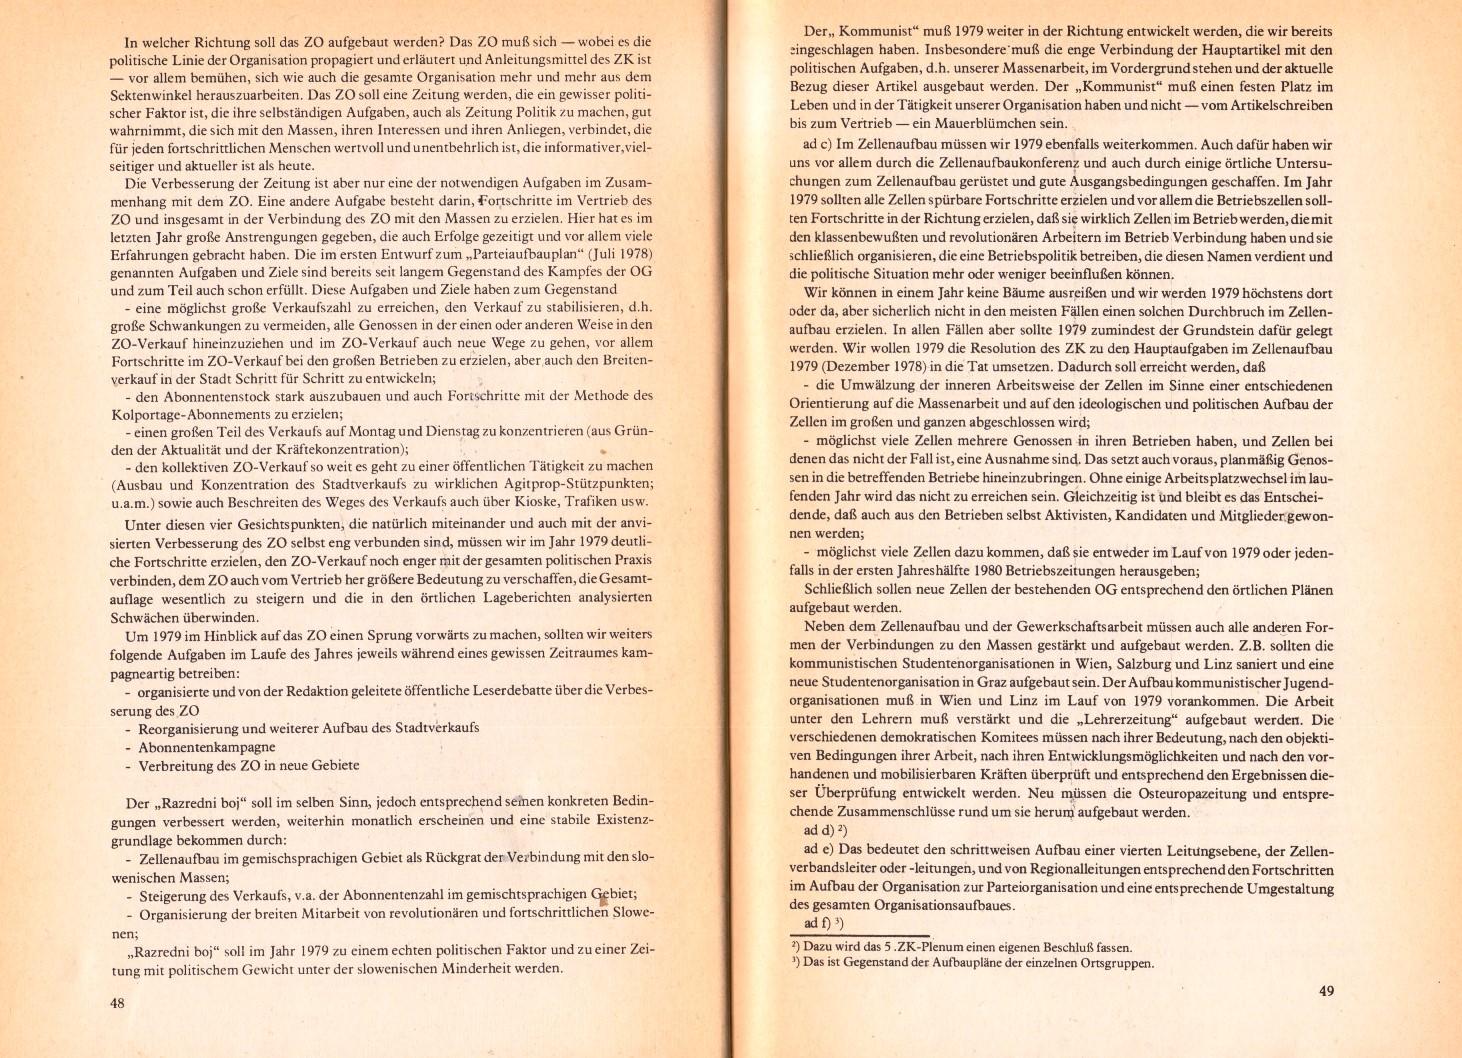 KBOe_1979_Doku_ZK_Plenum_04_26